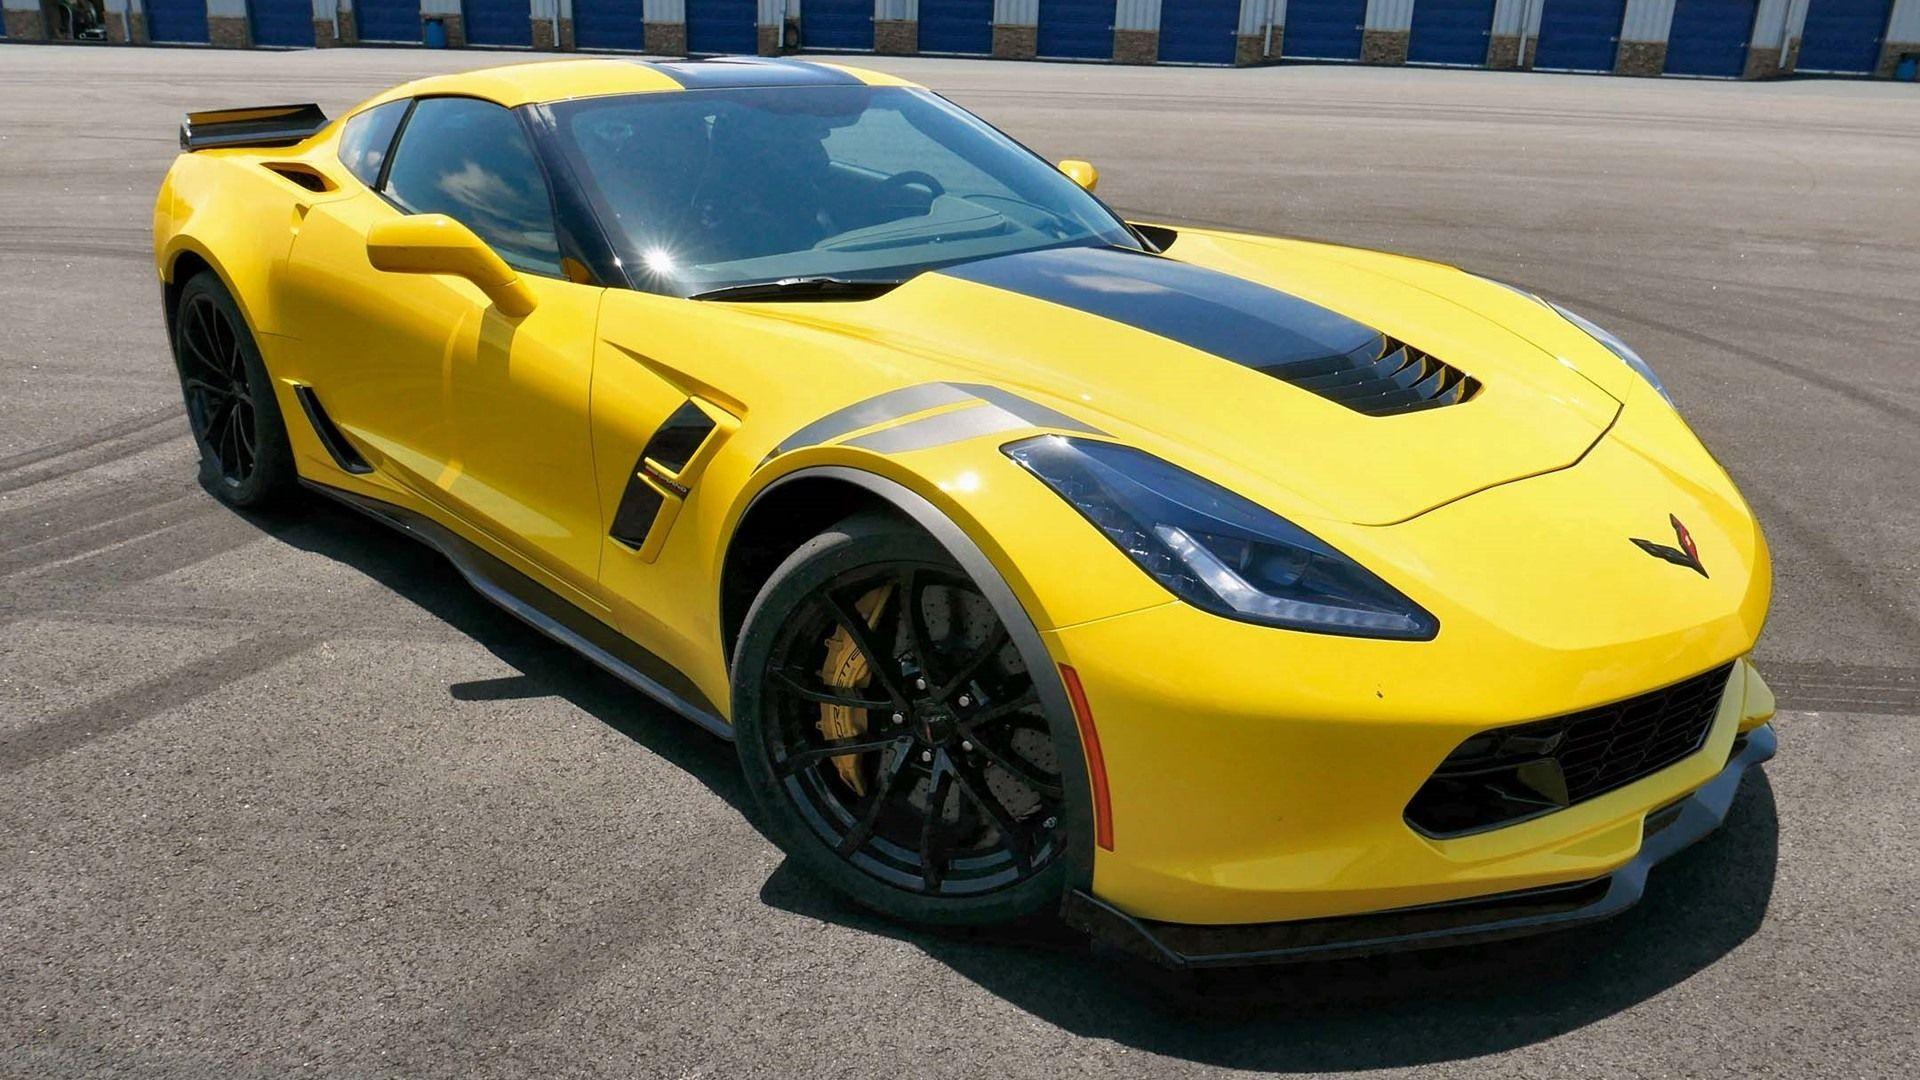 The 2017 Chevrolet Corvette Grand Sport Zr1 Z06 Review And Specs Corvette Grand Sport Chevrolet Corvette Yellow Corvette